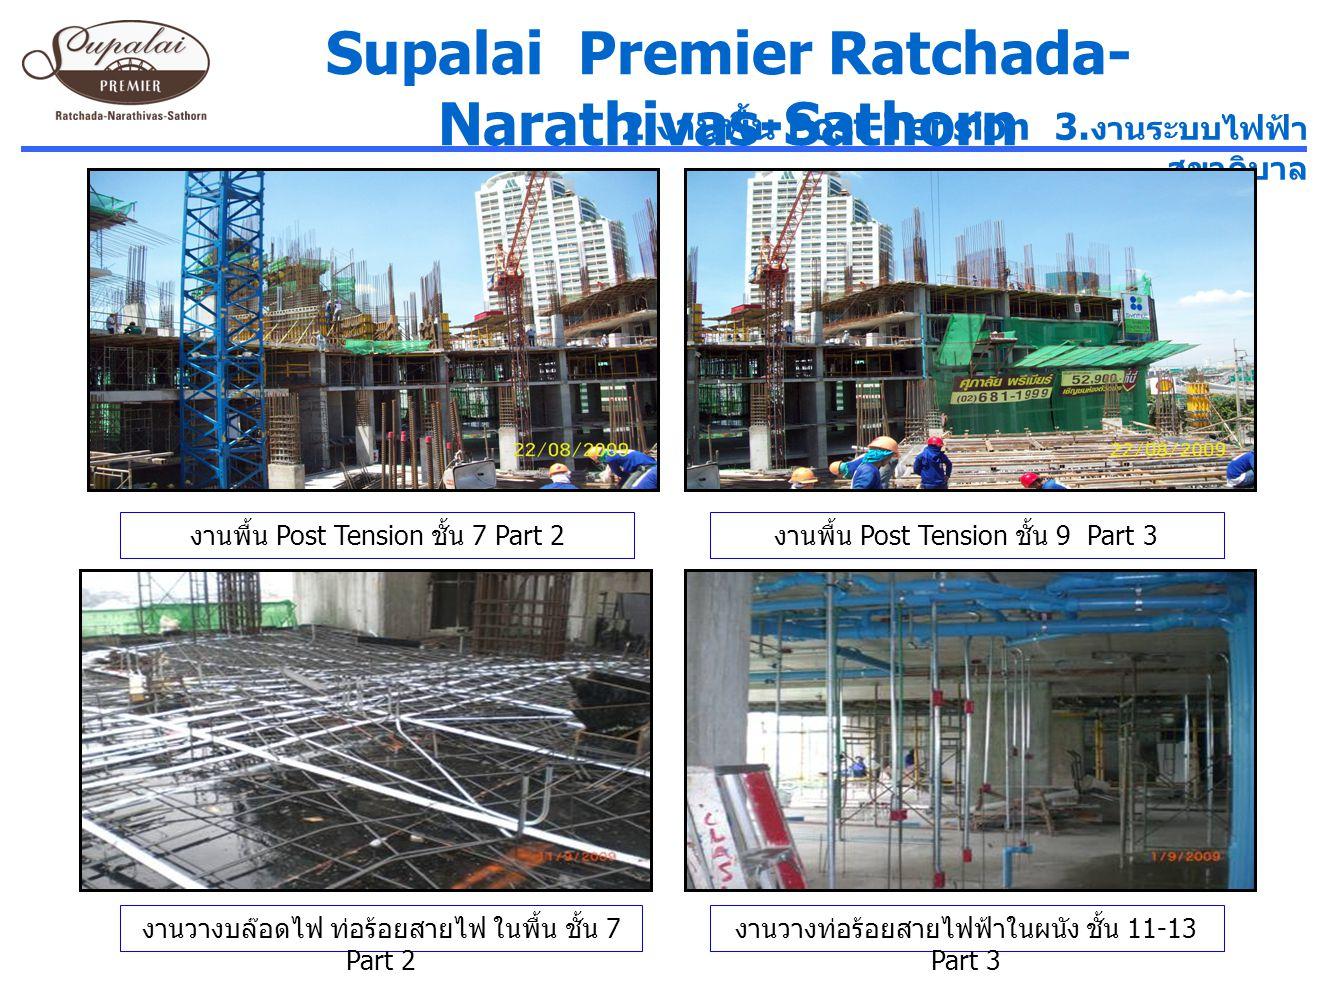 Supalai Premier Ratchada- Narathivas-Sathorn งานพื้น Post Tension ชั้น 7 Part 2 2. งานพื้น Post-Tension 3. งานระบบไฟฟ้า สุขาภิบาล งานวางบล๊อดไฟ ท่อร้อ